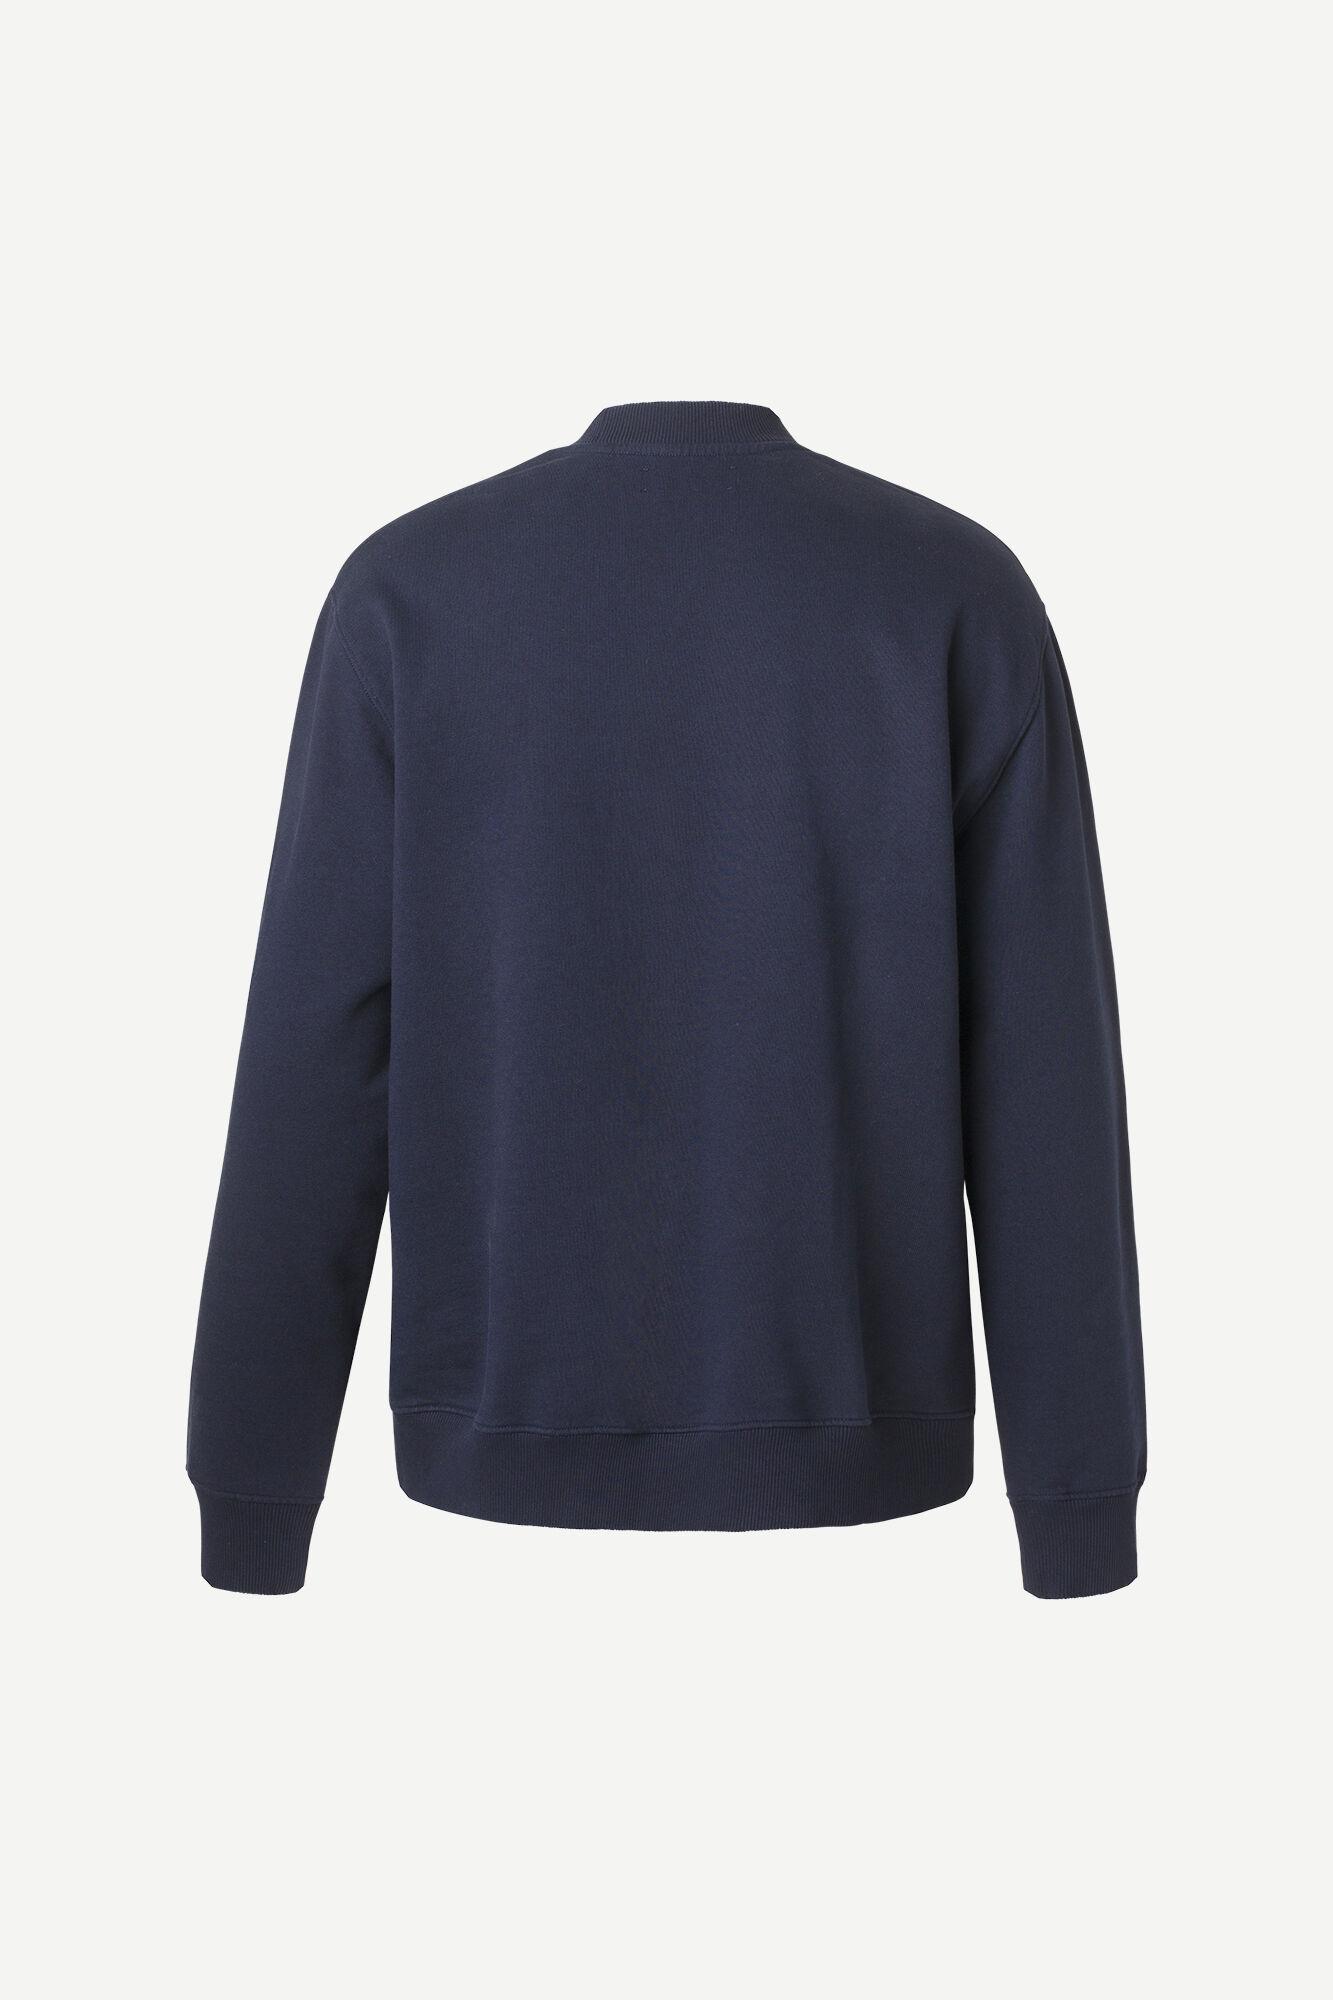 Samsøe & Samsøe Norsbro sweatshirt, sky captain, small